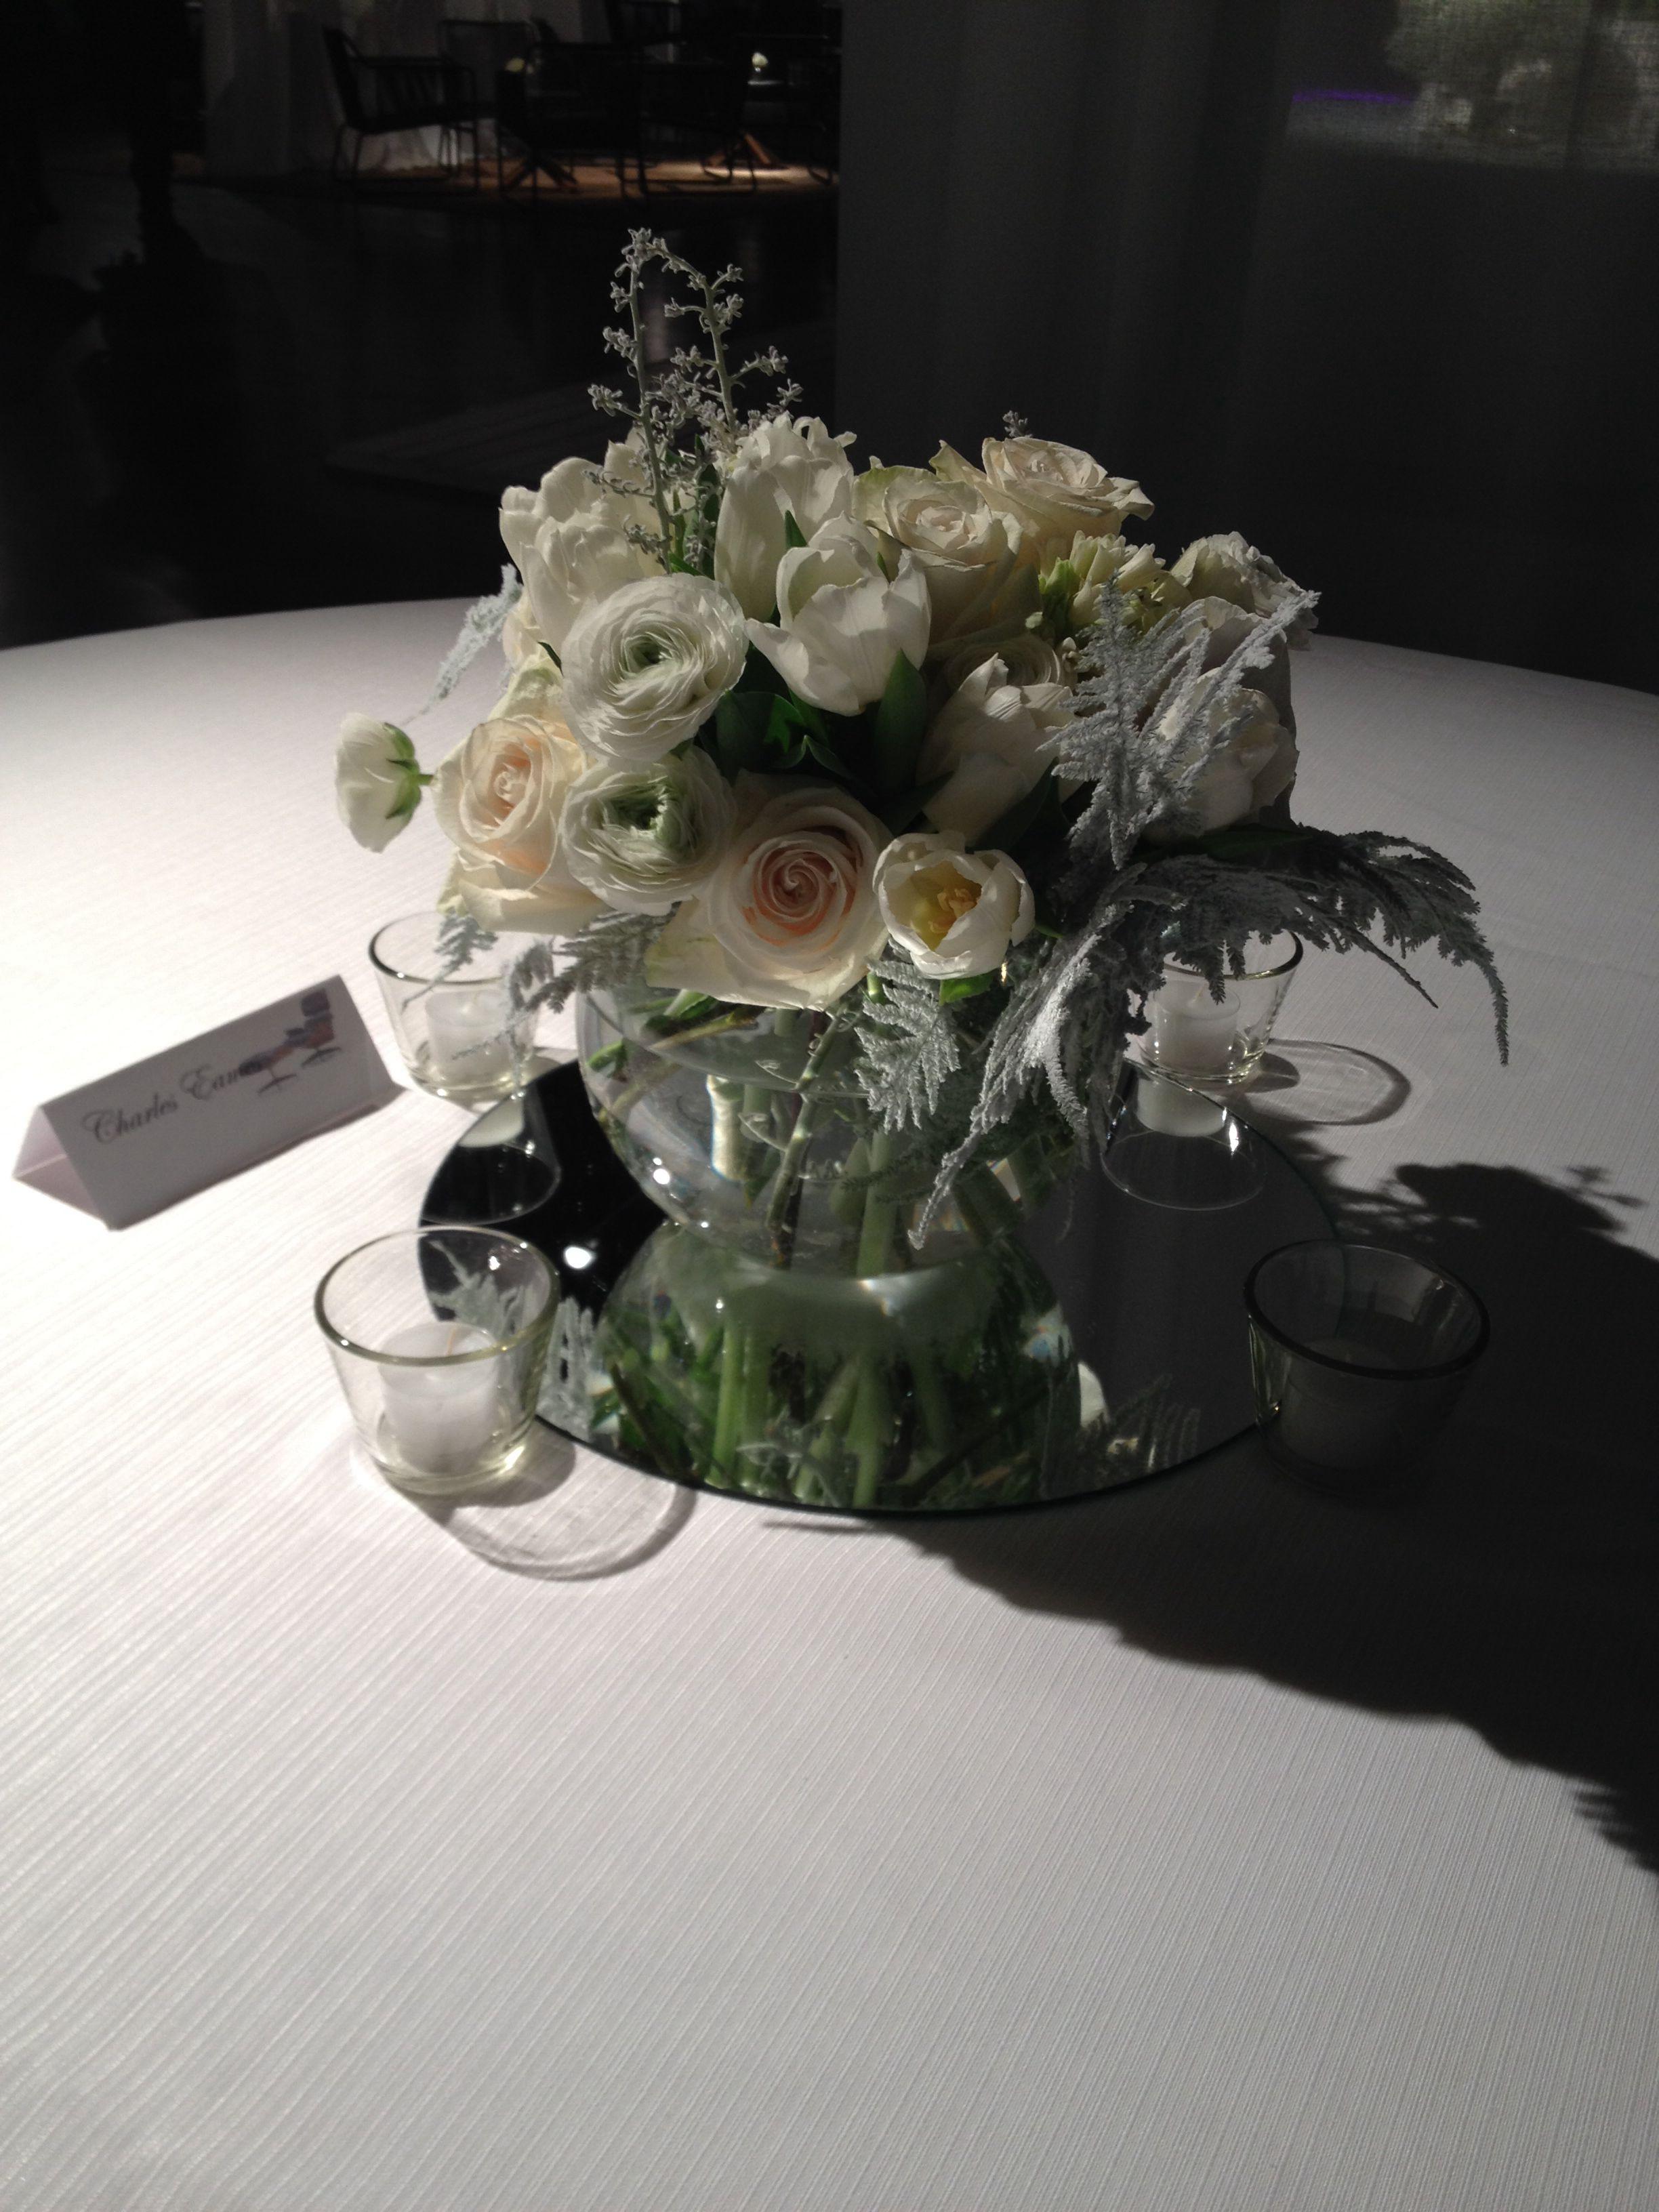 #winterwedding #weddingdesign #whitedesign #weddingideas #flowerdesign #fiordifragola #fiordifragolastyle